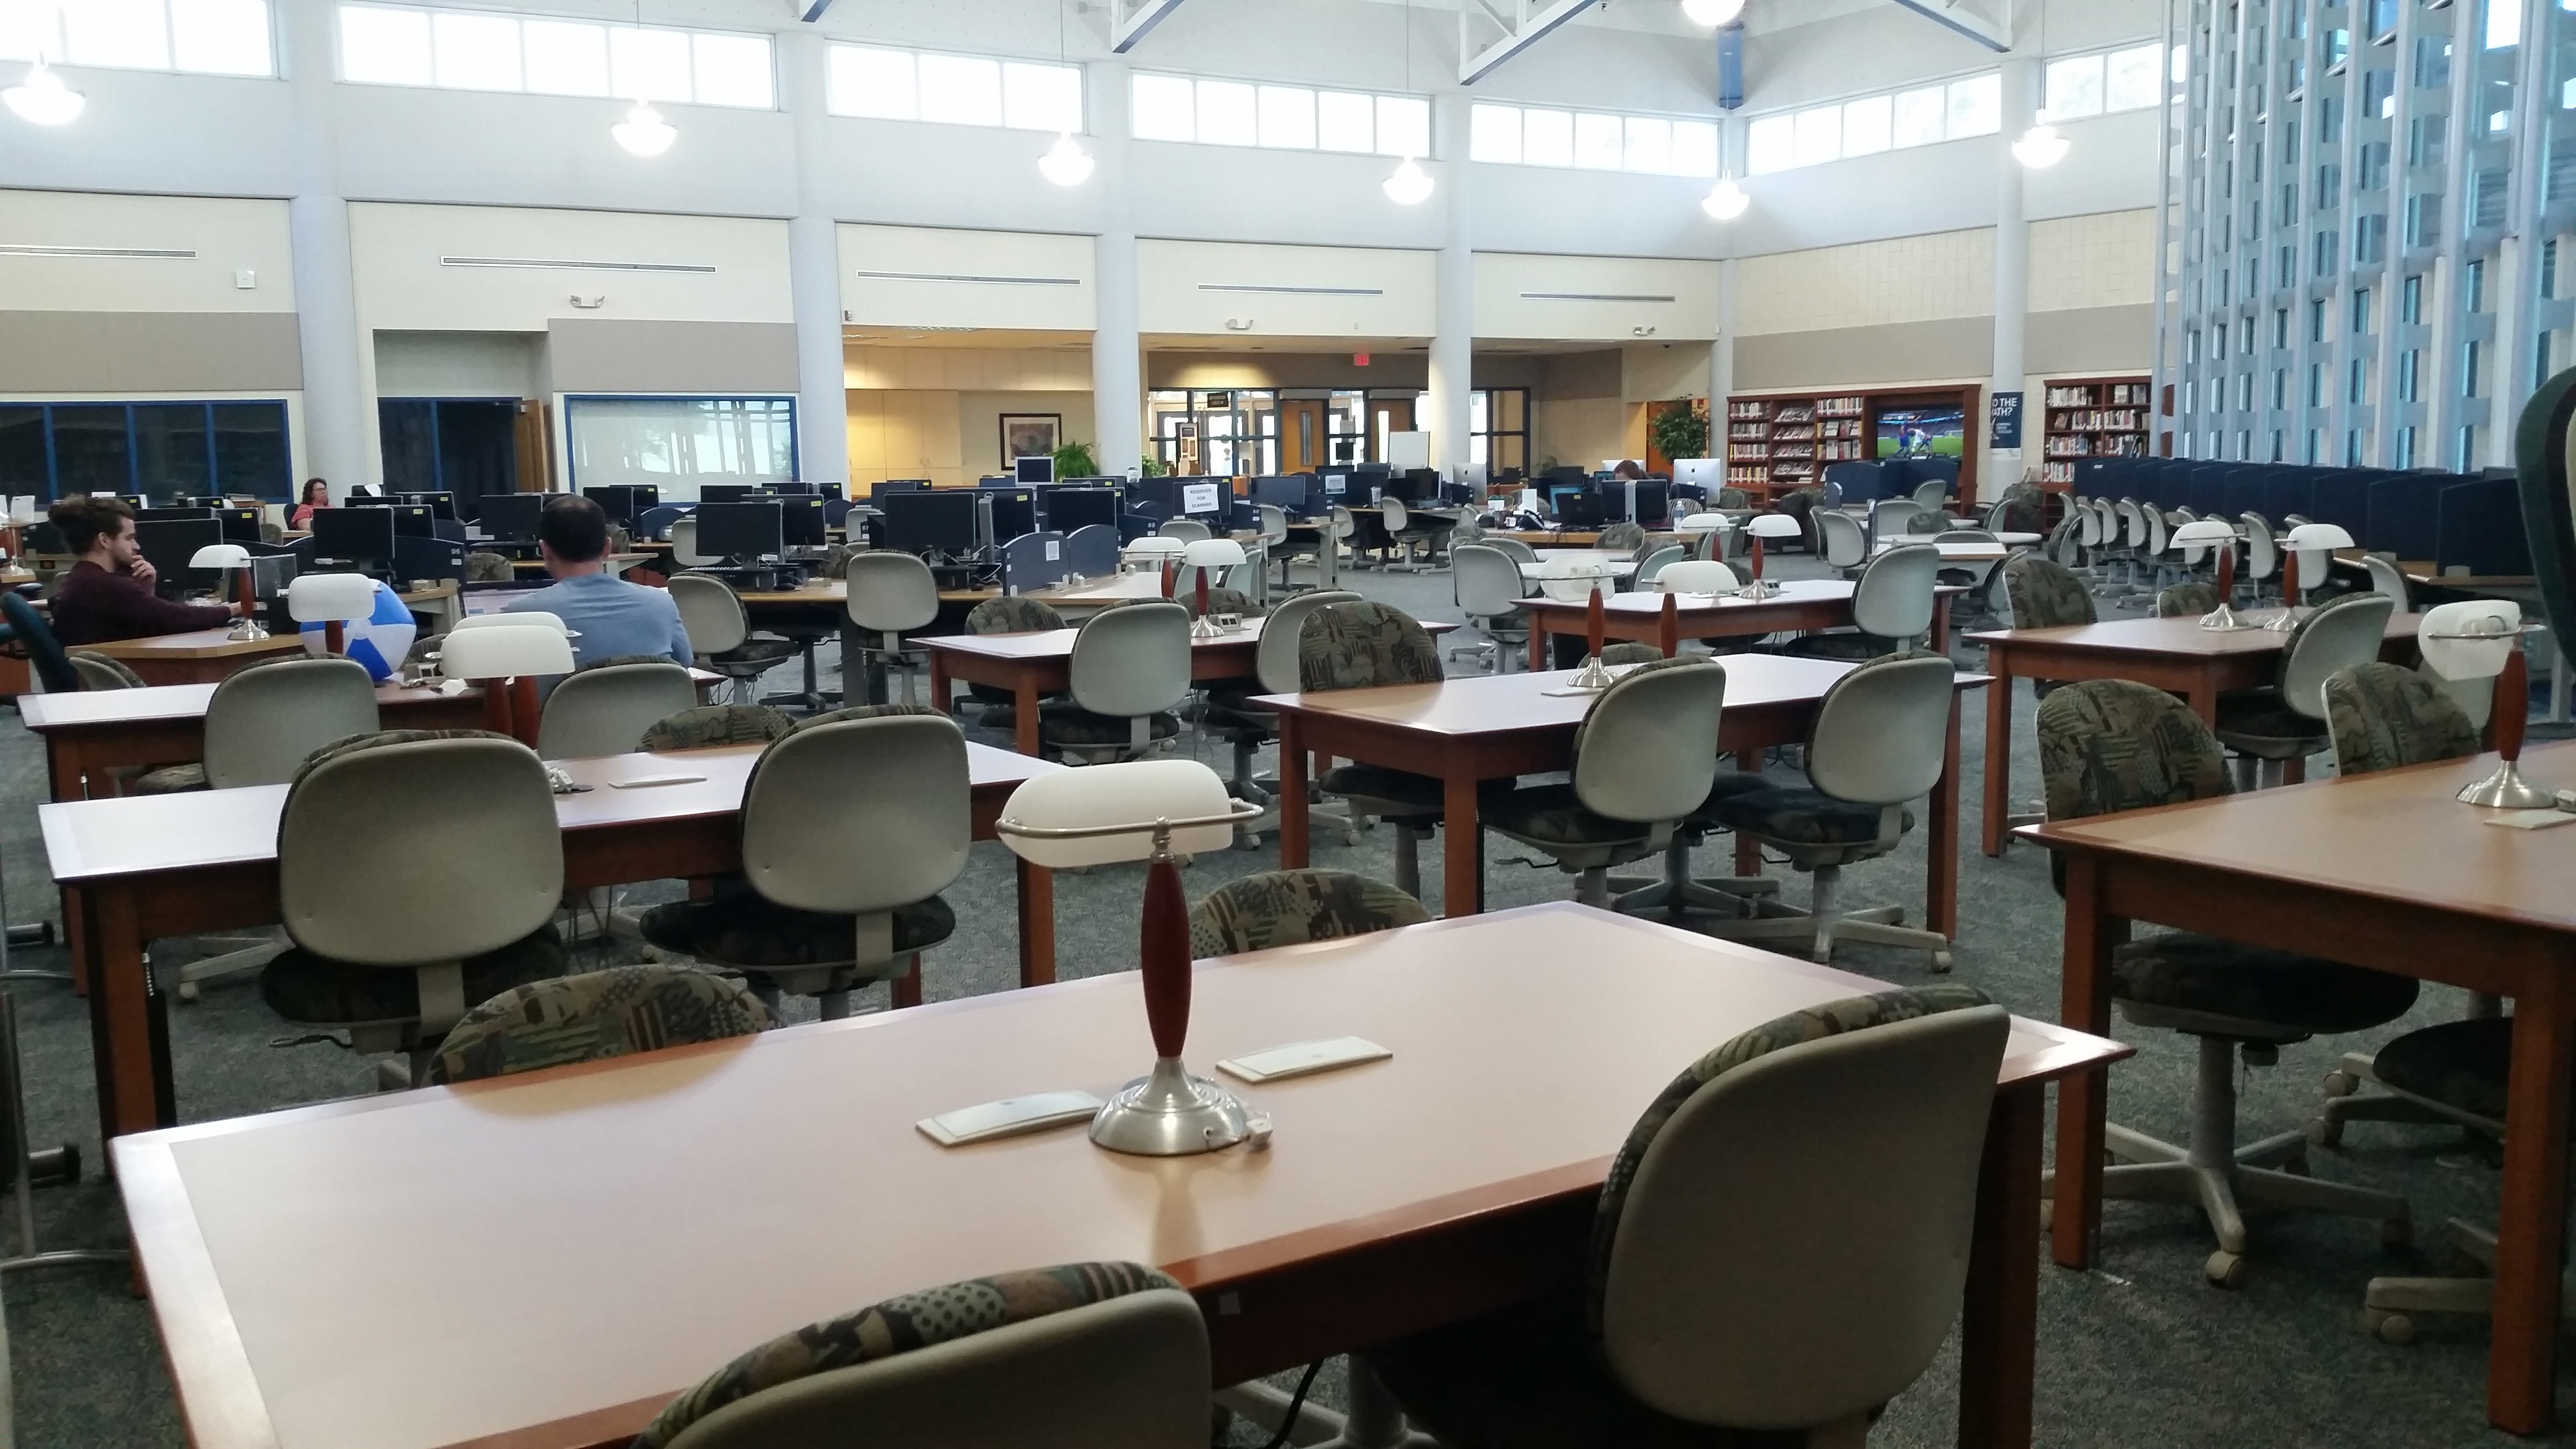 Welcome - Academic Tutoring Services, Seminole Campus